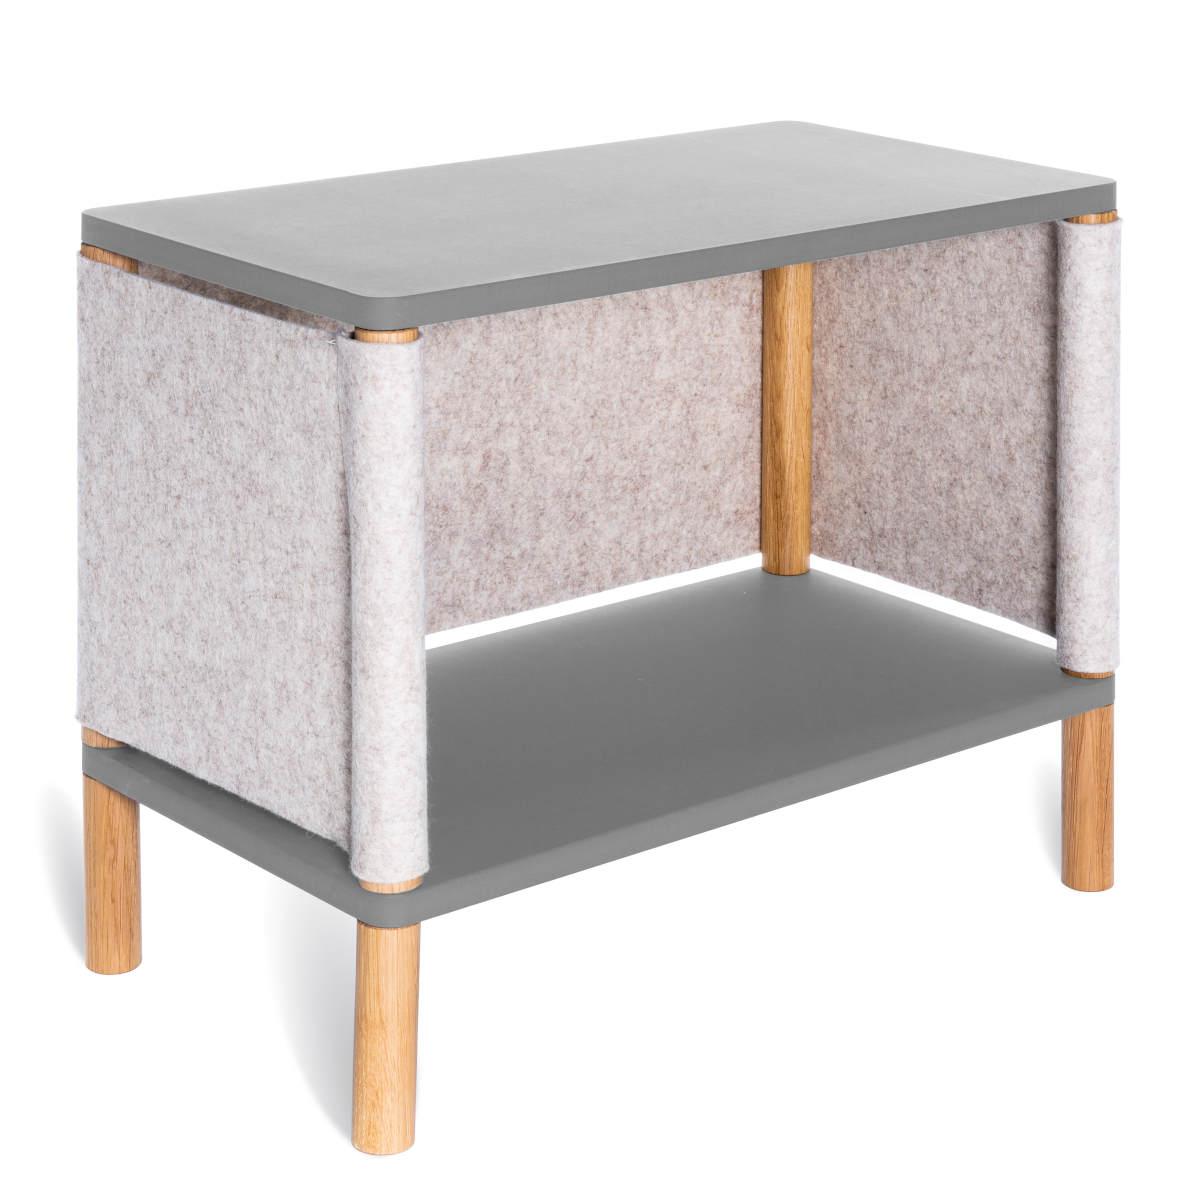 - Low Modular Children's Shelf